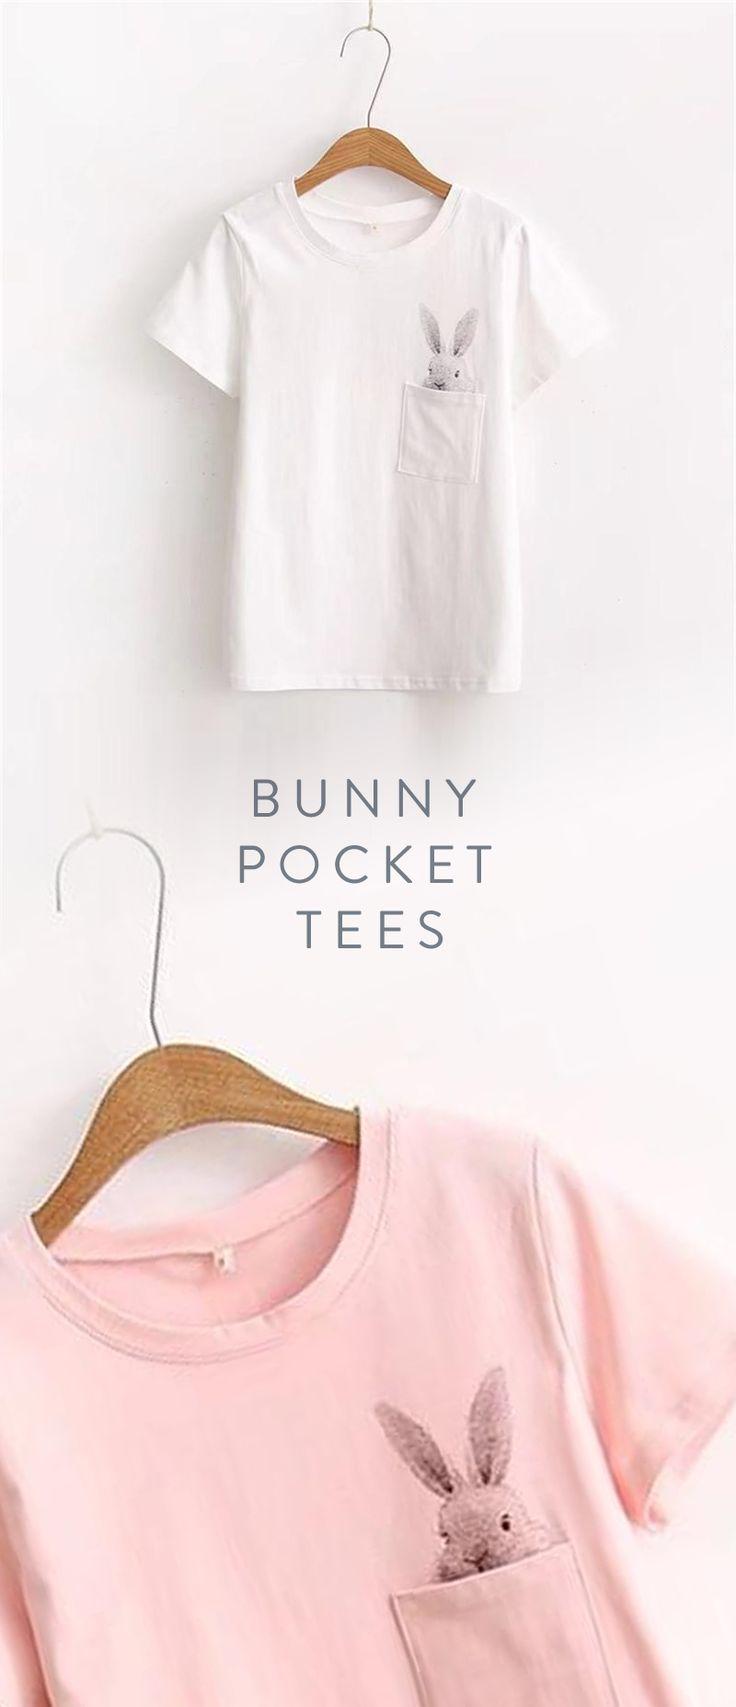 Bunny Pocket Tees